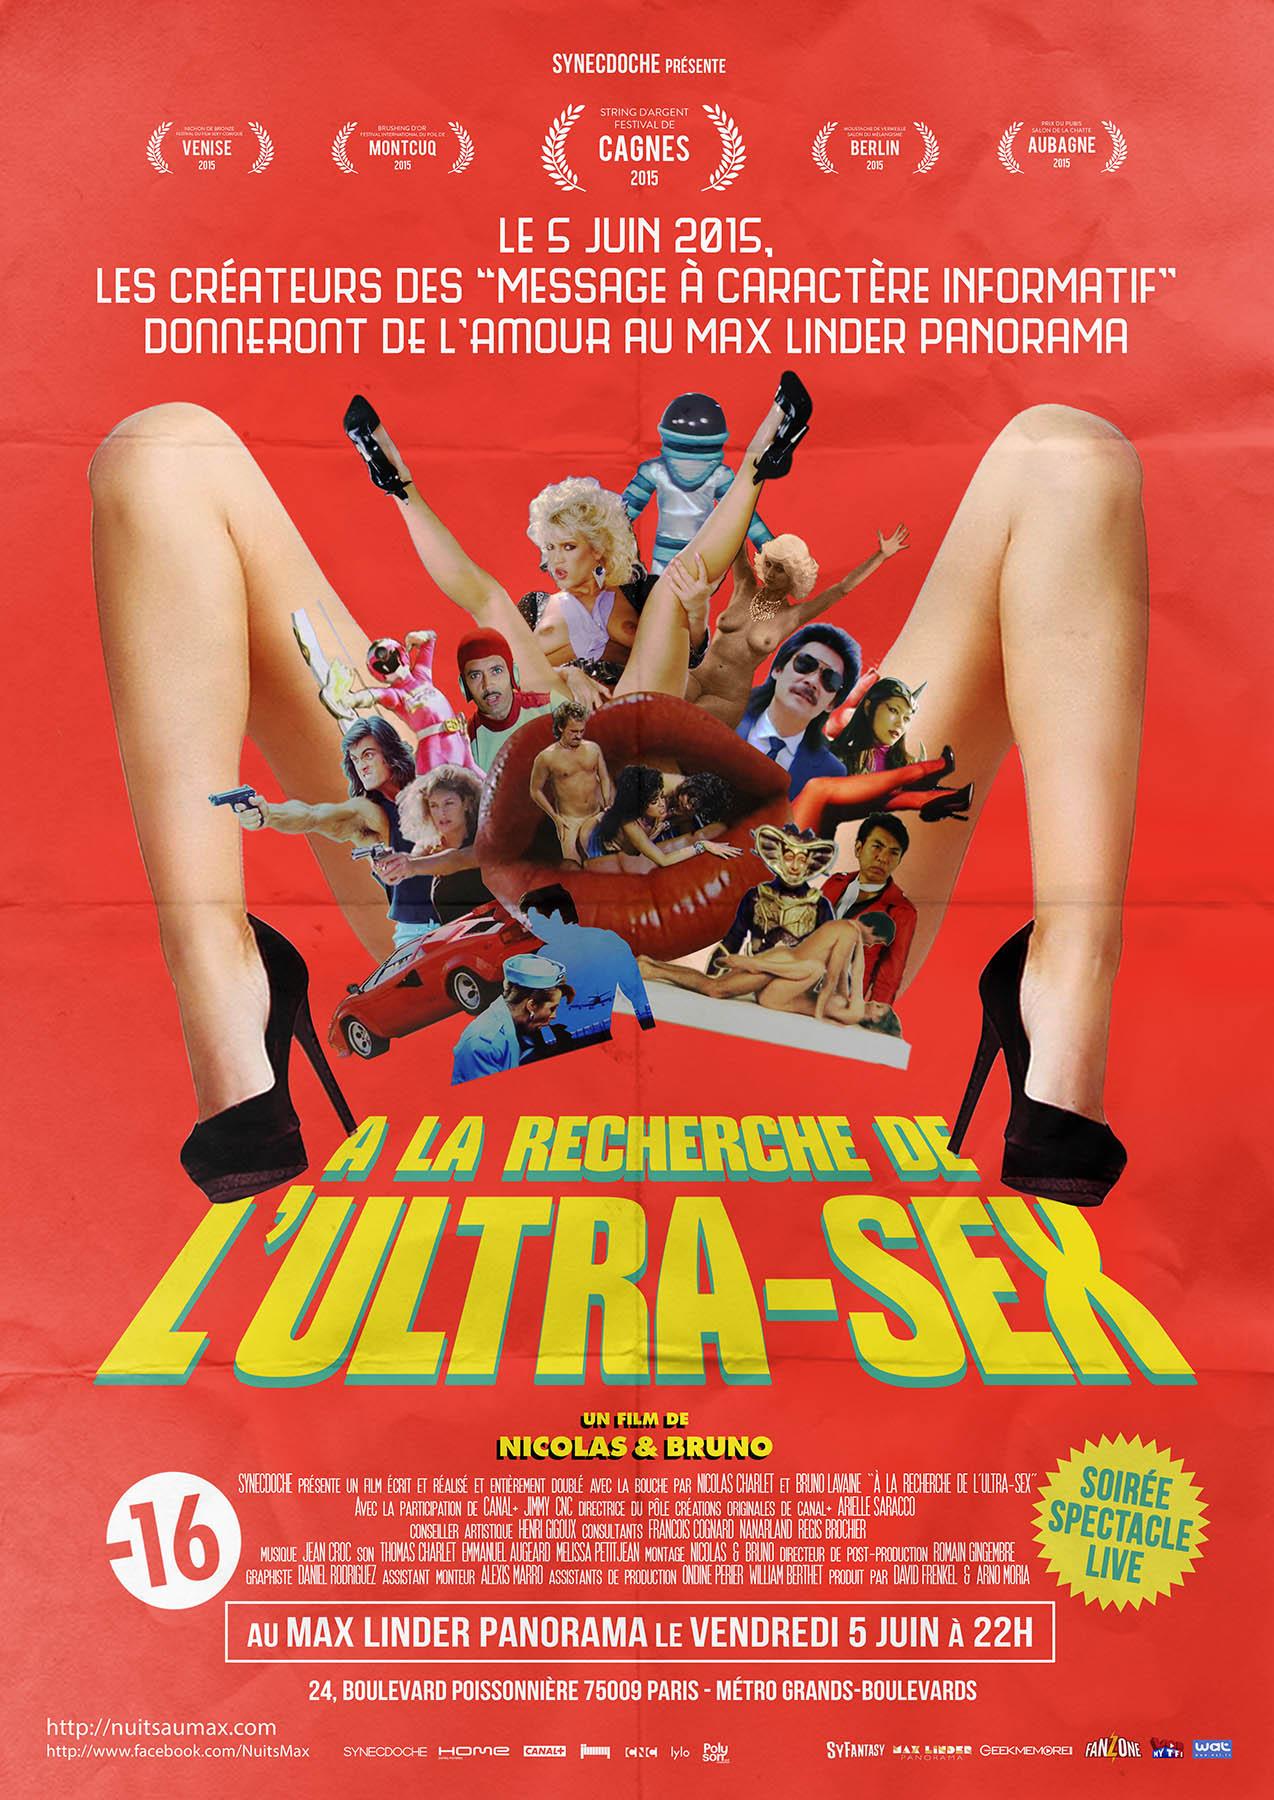 A La Recherche De L'ultra-sex : recherche, l'ultra-sex, Recherche, L'Ultra-Sex, Search, Ultra-Sex], (2015), Kalafudra's, Stuff